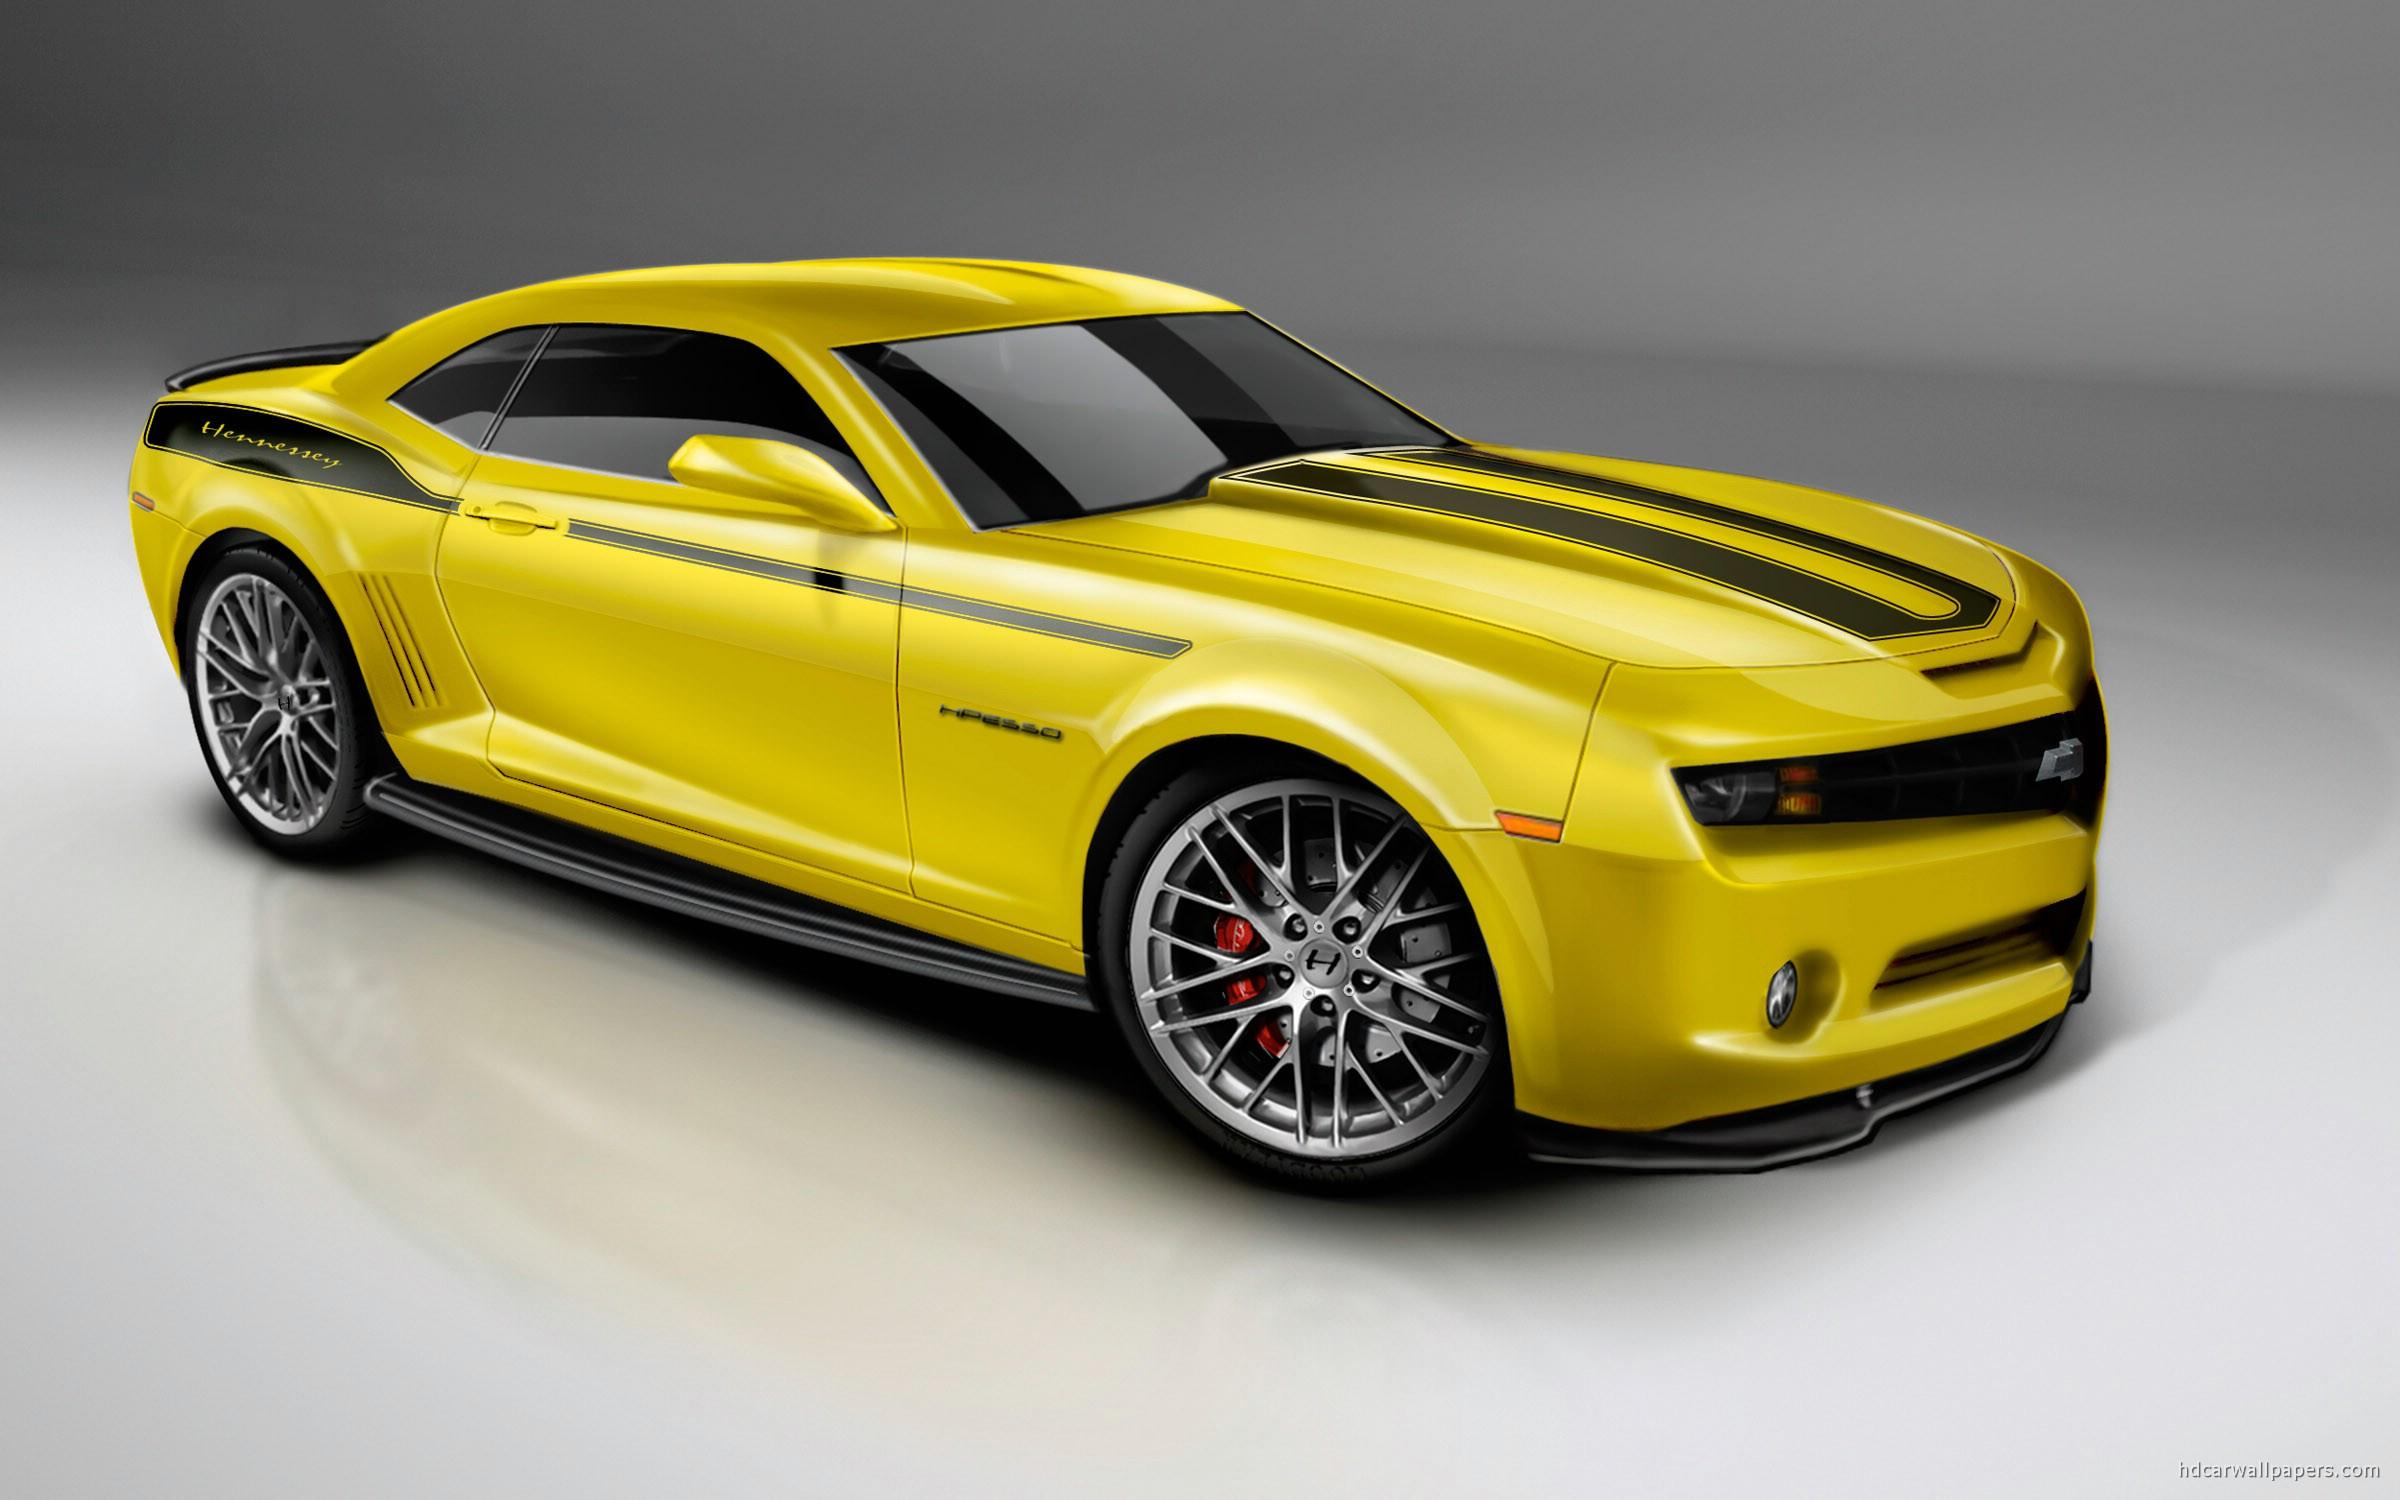 yellow car 2015 09 - photo #2